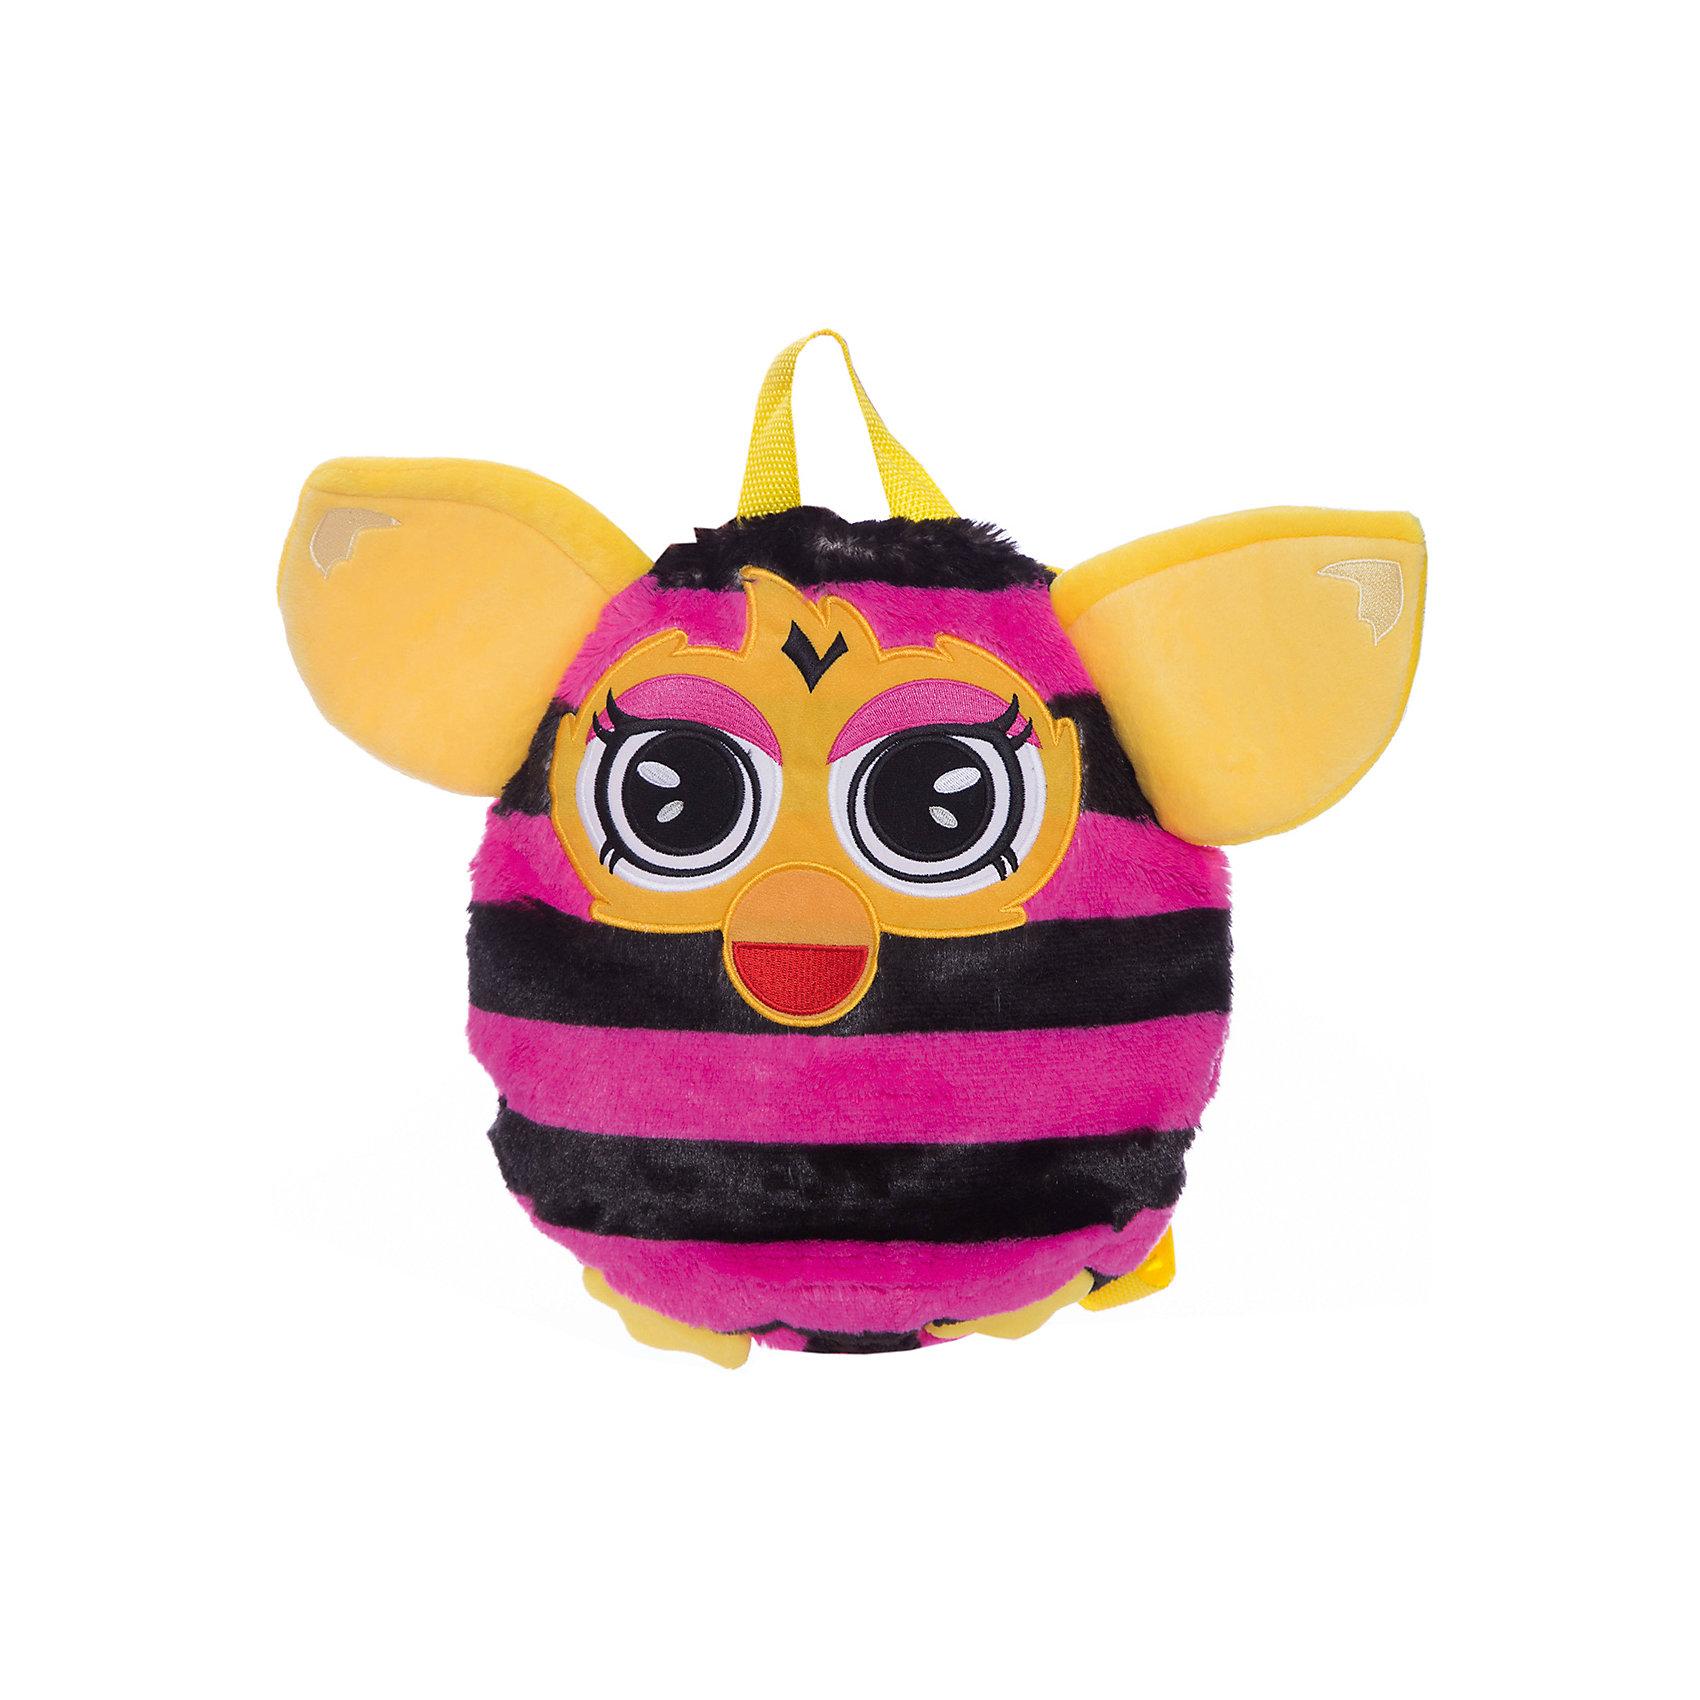 - Furby рюкзак 35 см, в полоску, 1Toy furby рюкзак 35 см в полоску 1toy